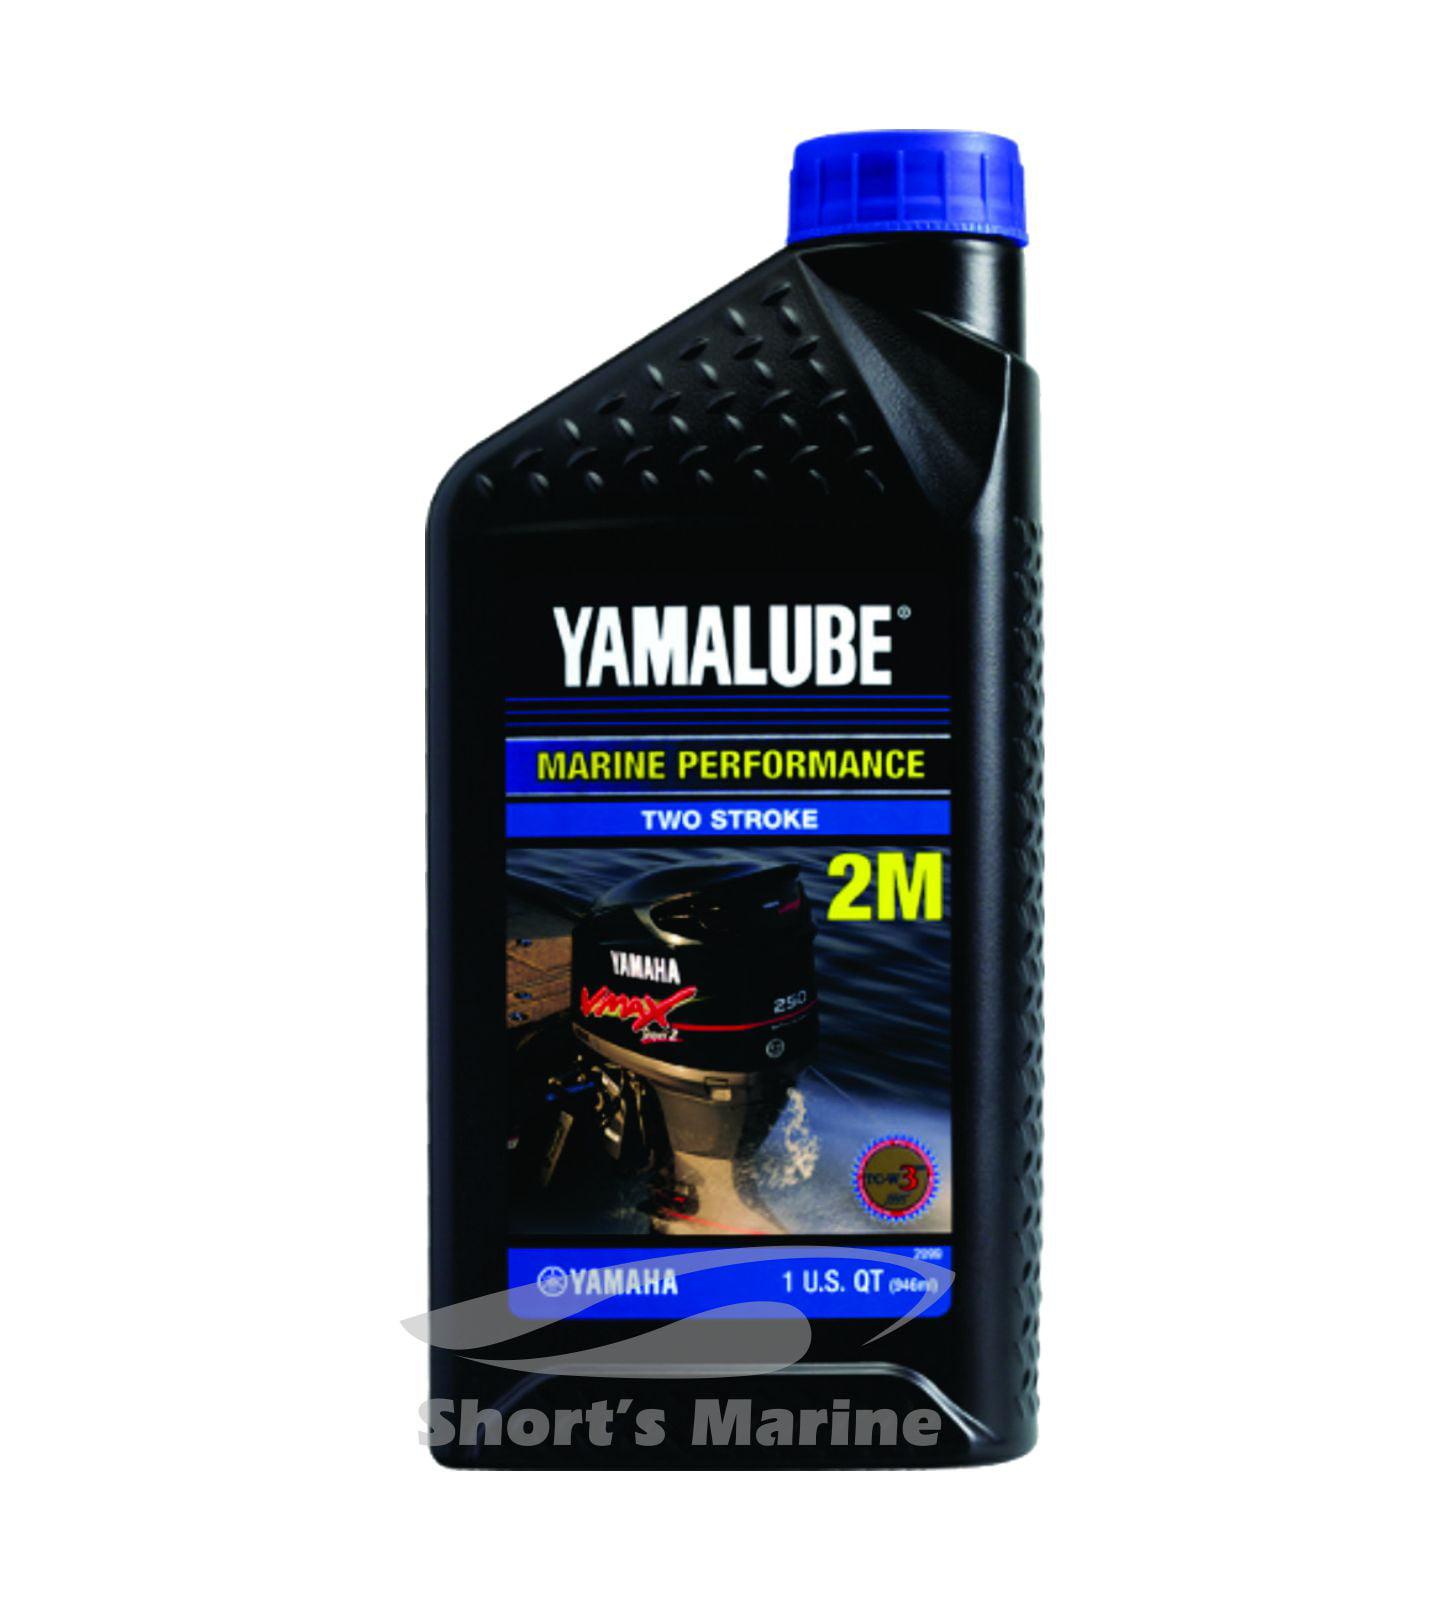 Yamaha Yamalube Outboard Marine Performance 2-Stroke TCW-3 Oil One Quart